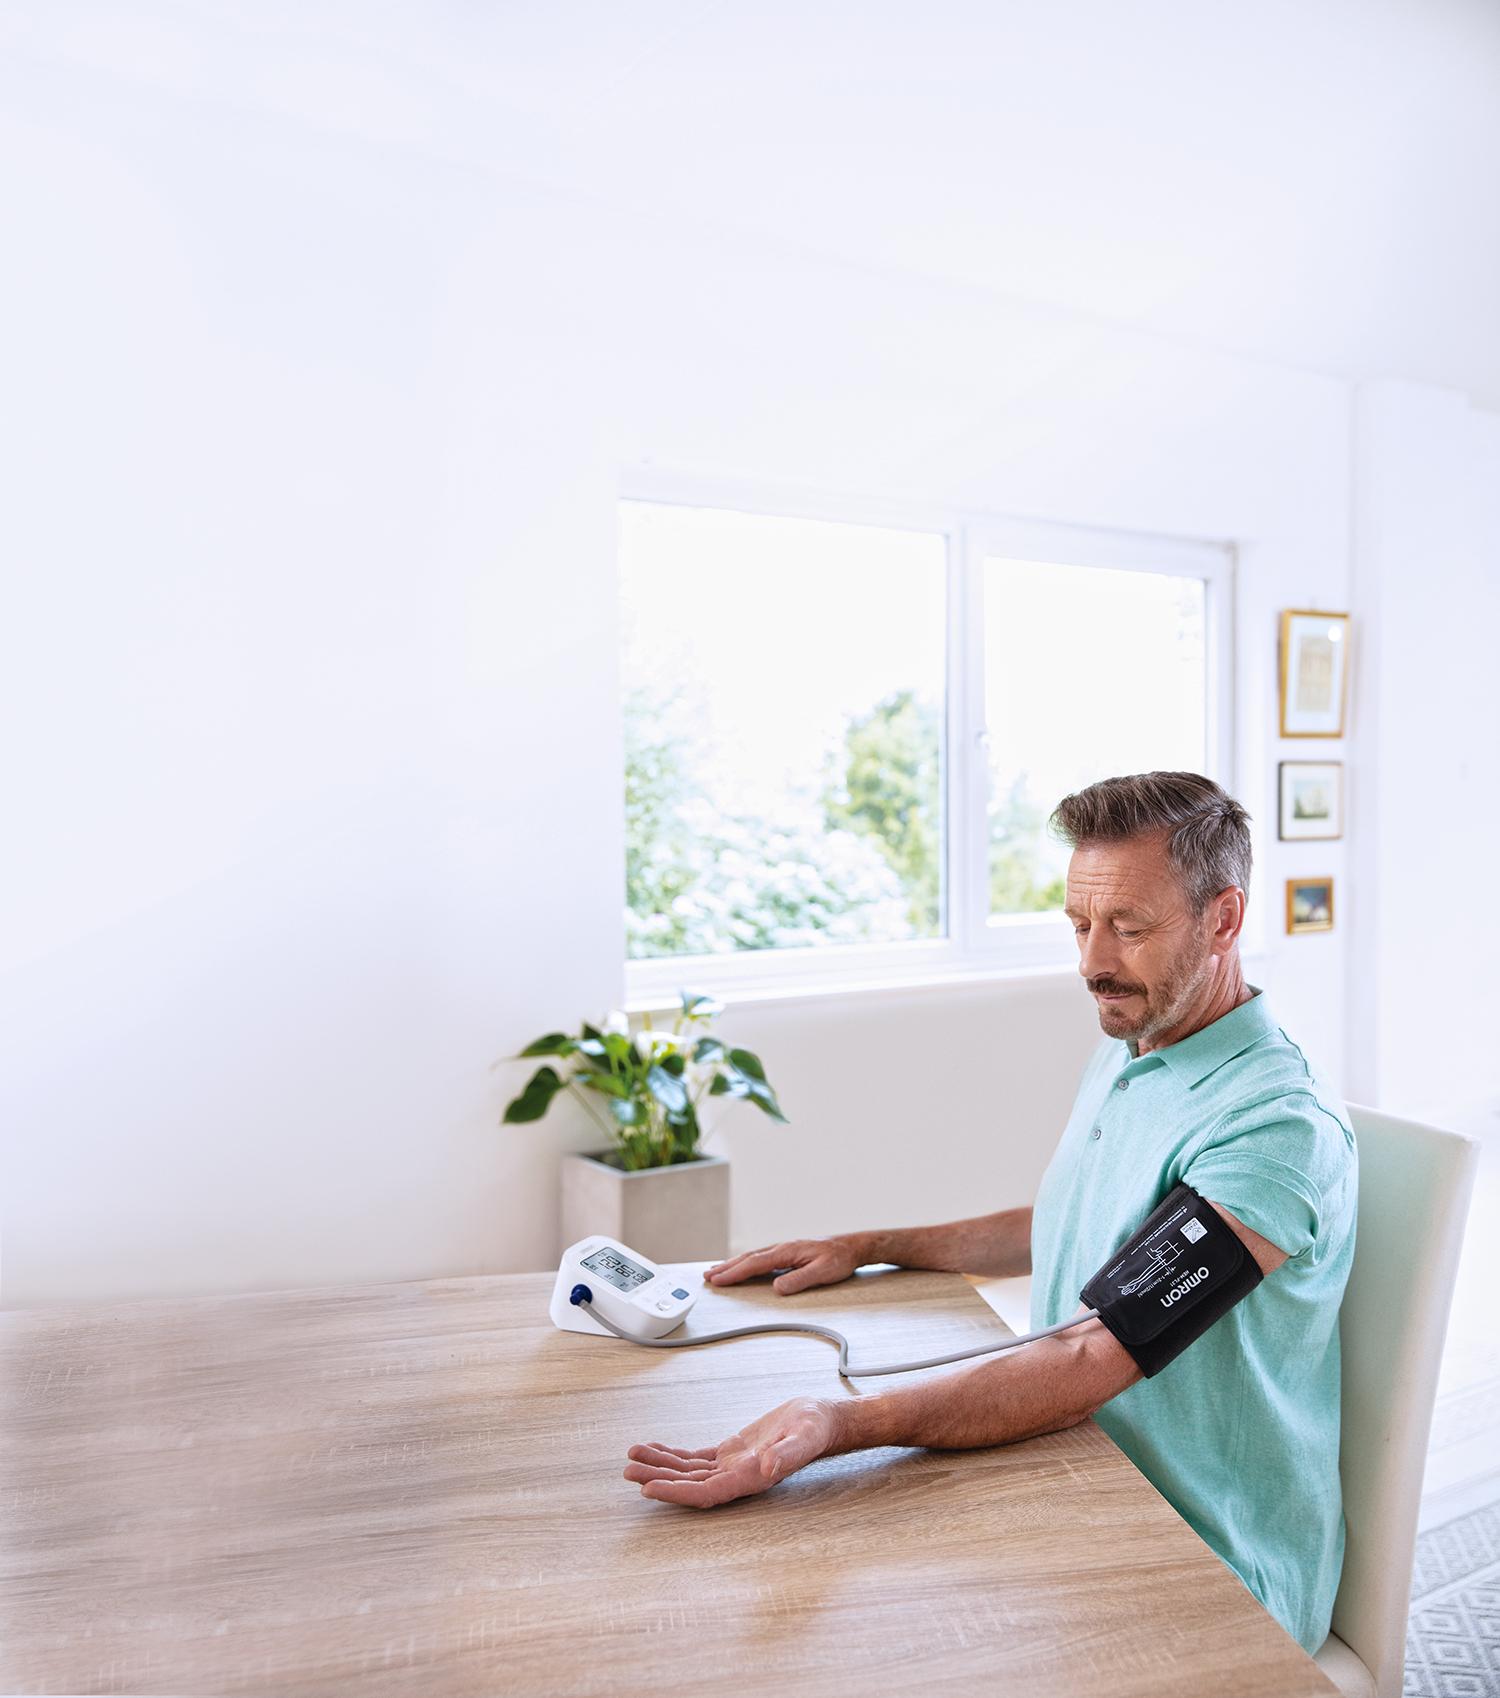 Meet je je bloeddruk best aan je bovenarm of pols?